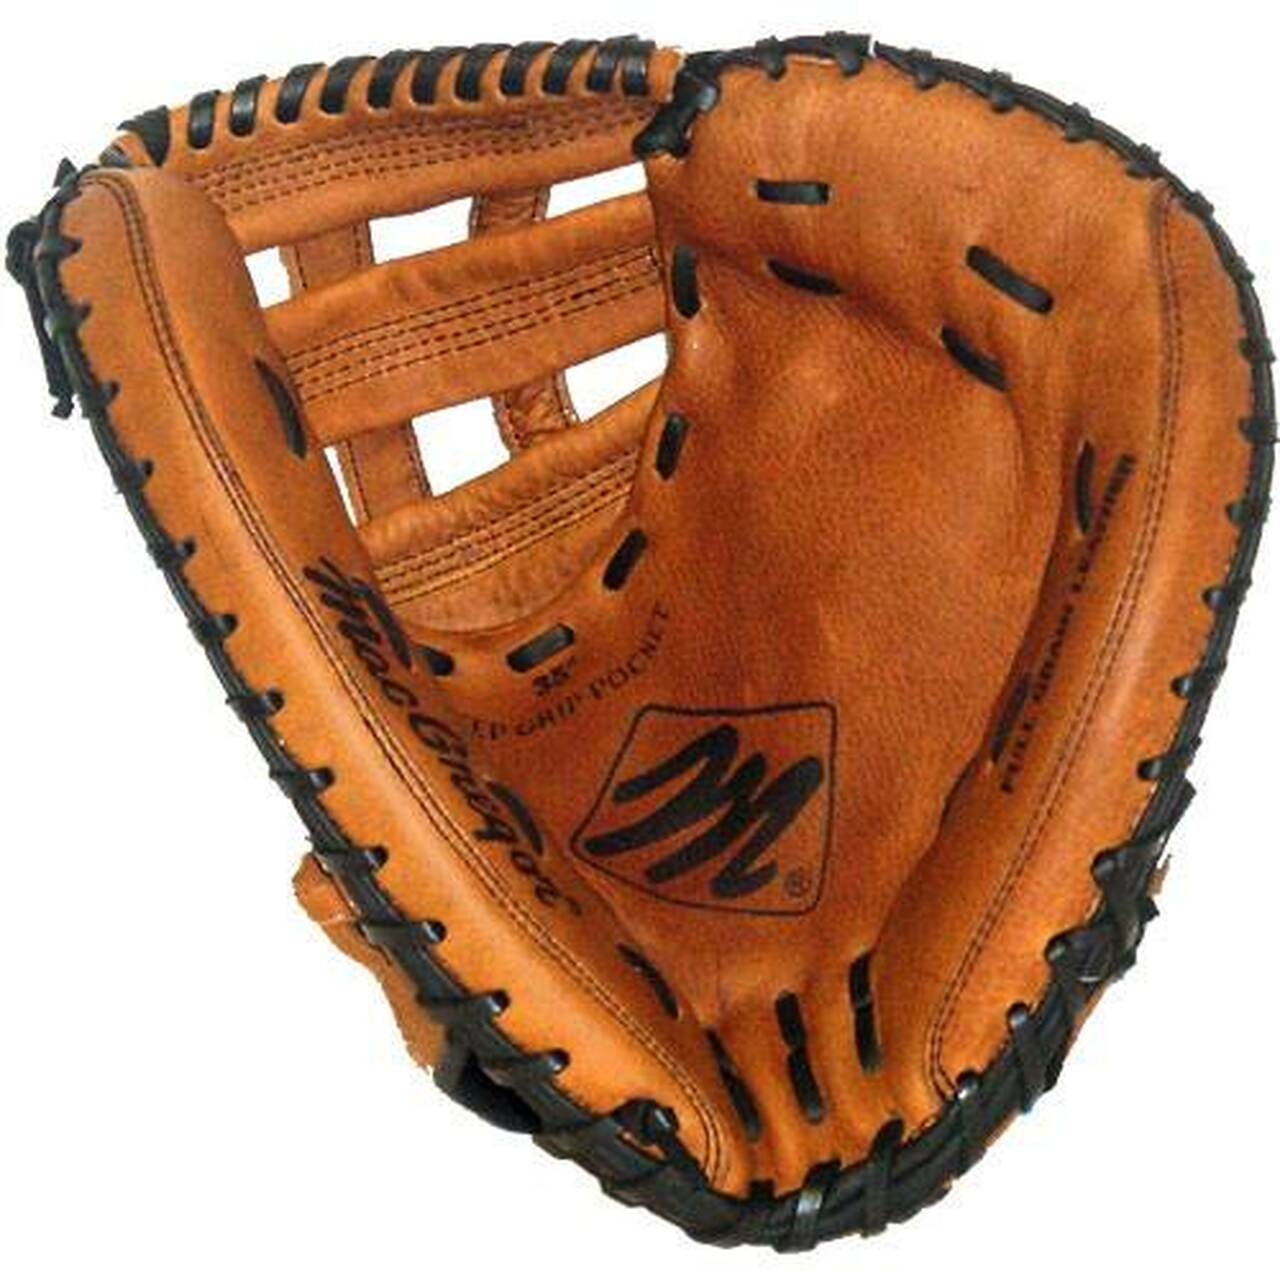 MacGregor Fastpitch Baseball Catcher's Mitt RHT